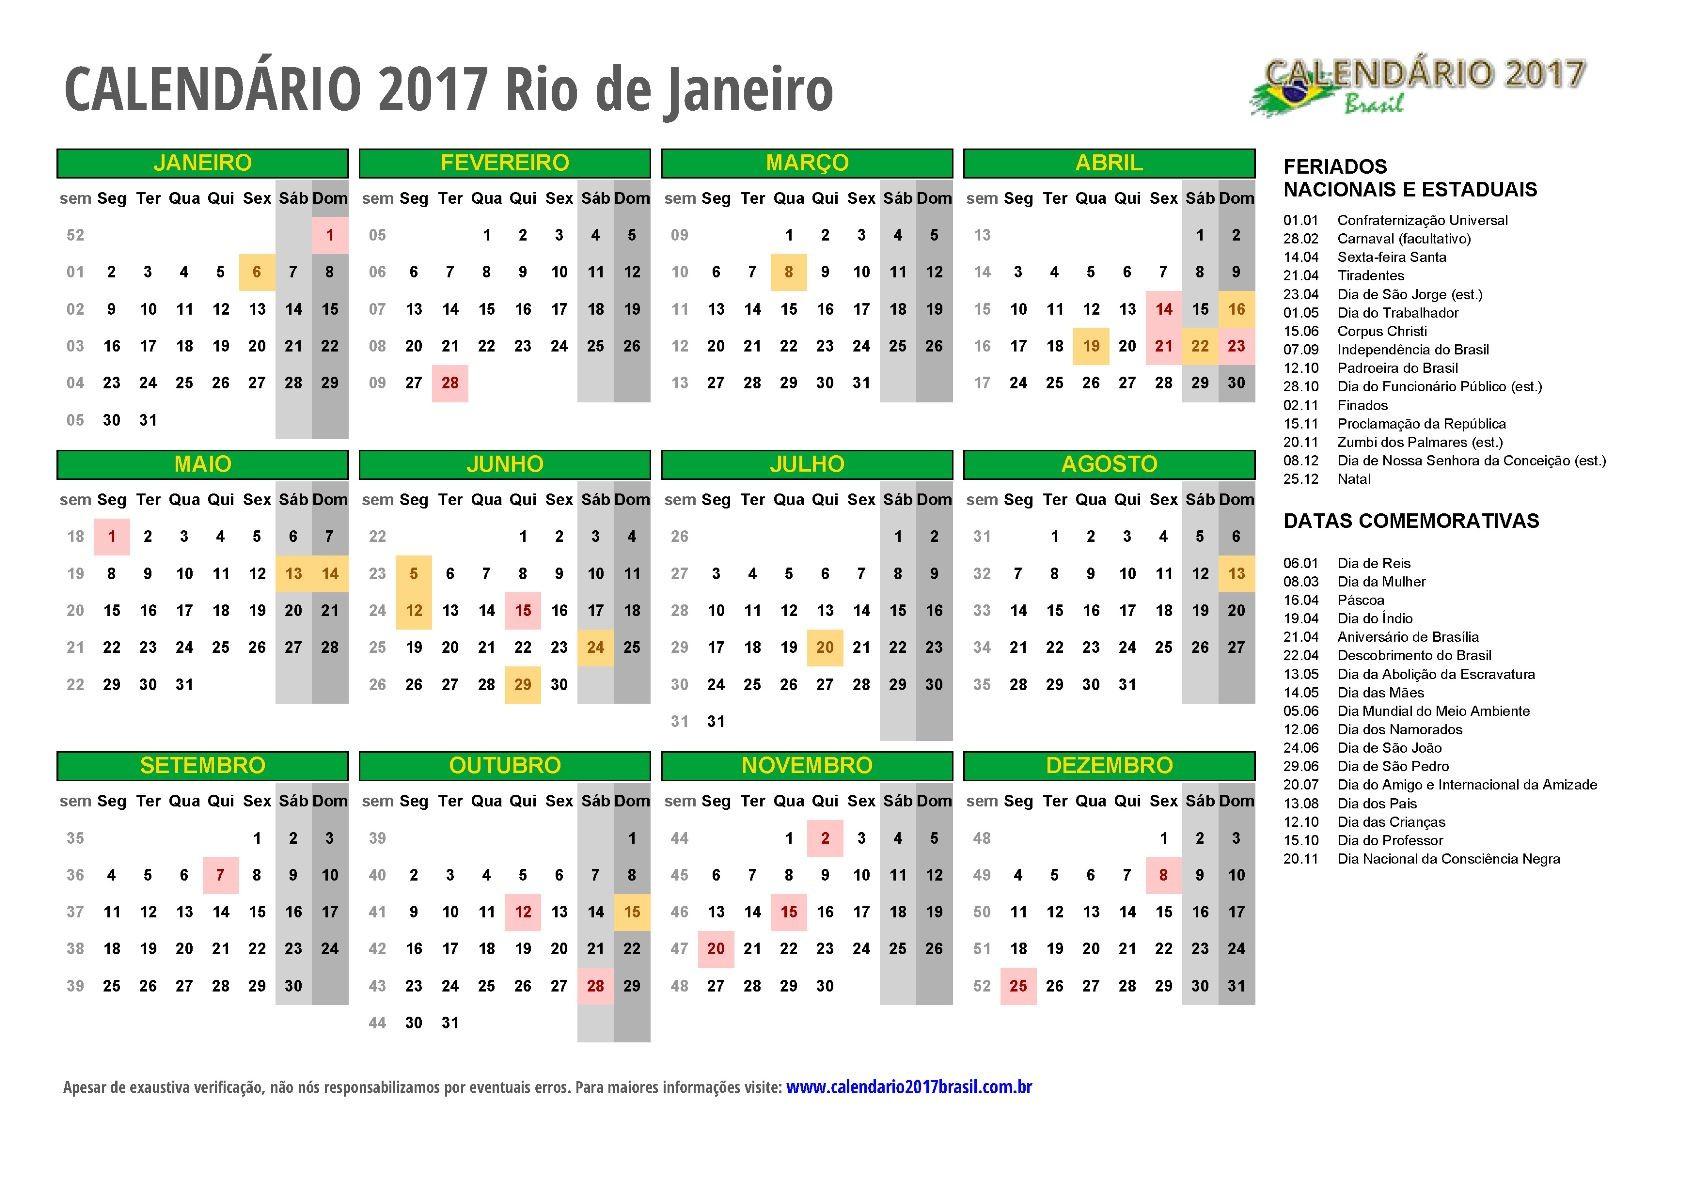 Calendario 2019 Feriados Natal Rn Más Recientemente Liberado Calendario 2018 Rj Hz43 Ivango Of Calendario 2019 Feriados Natal Rn Más Actual Calendario 2018 Rj Hz43 Ivango